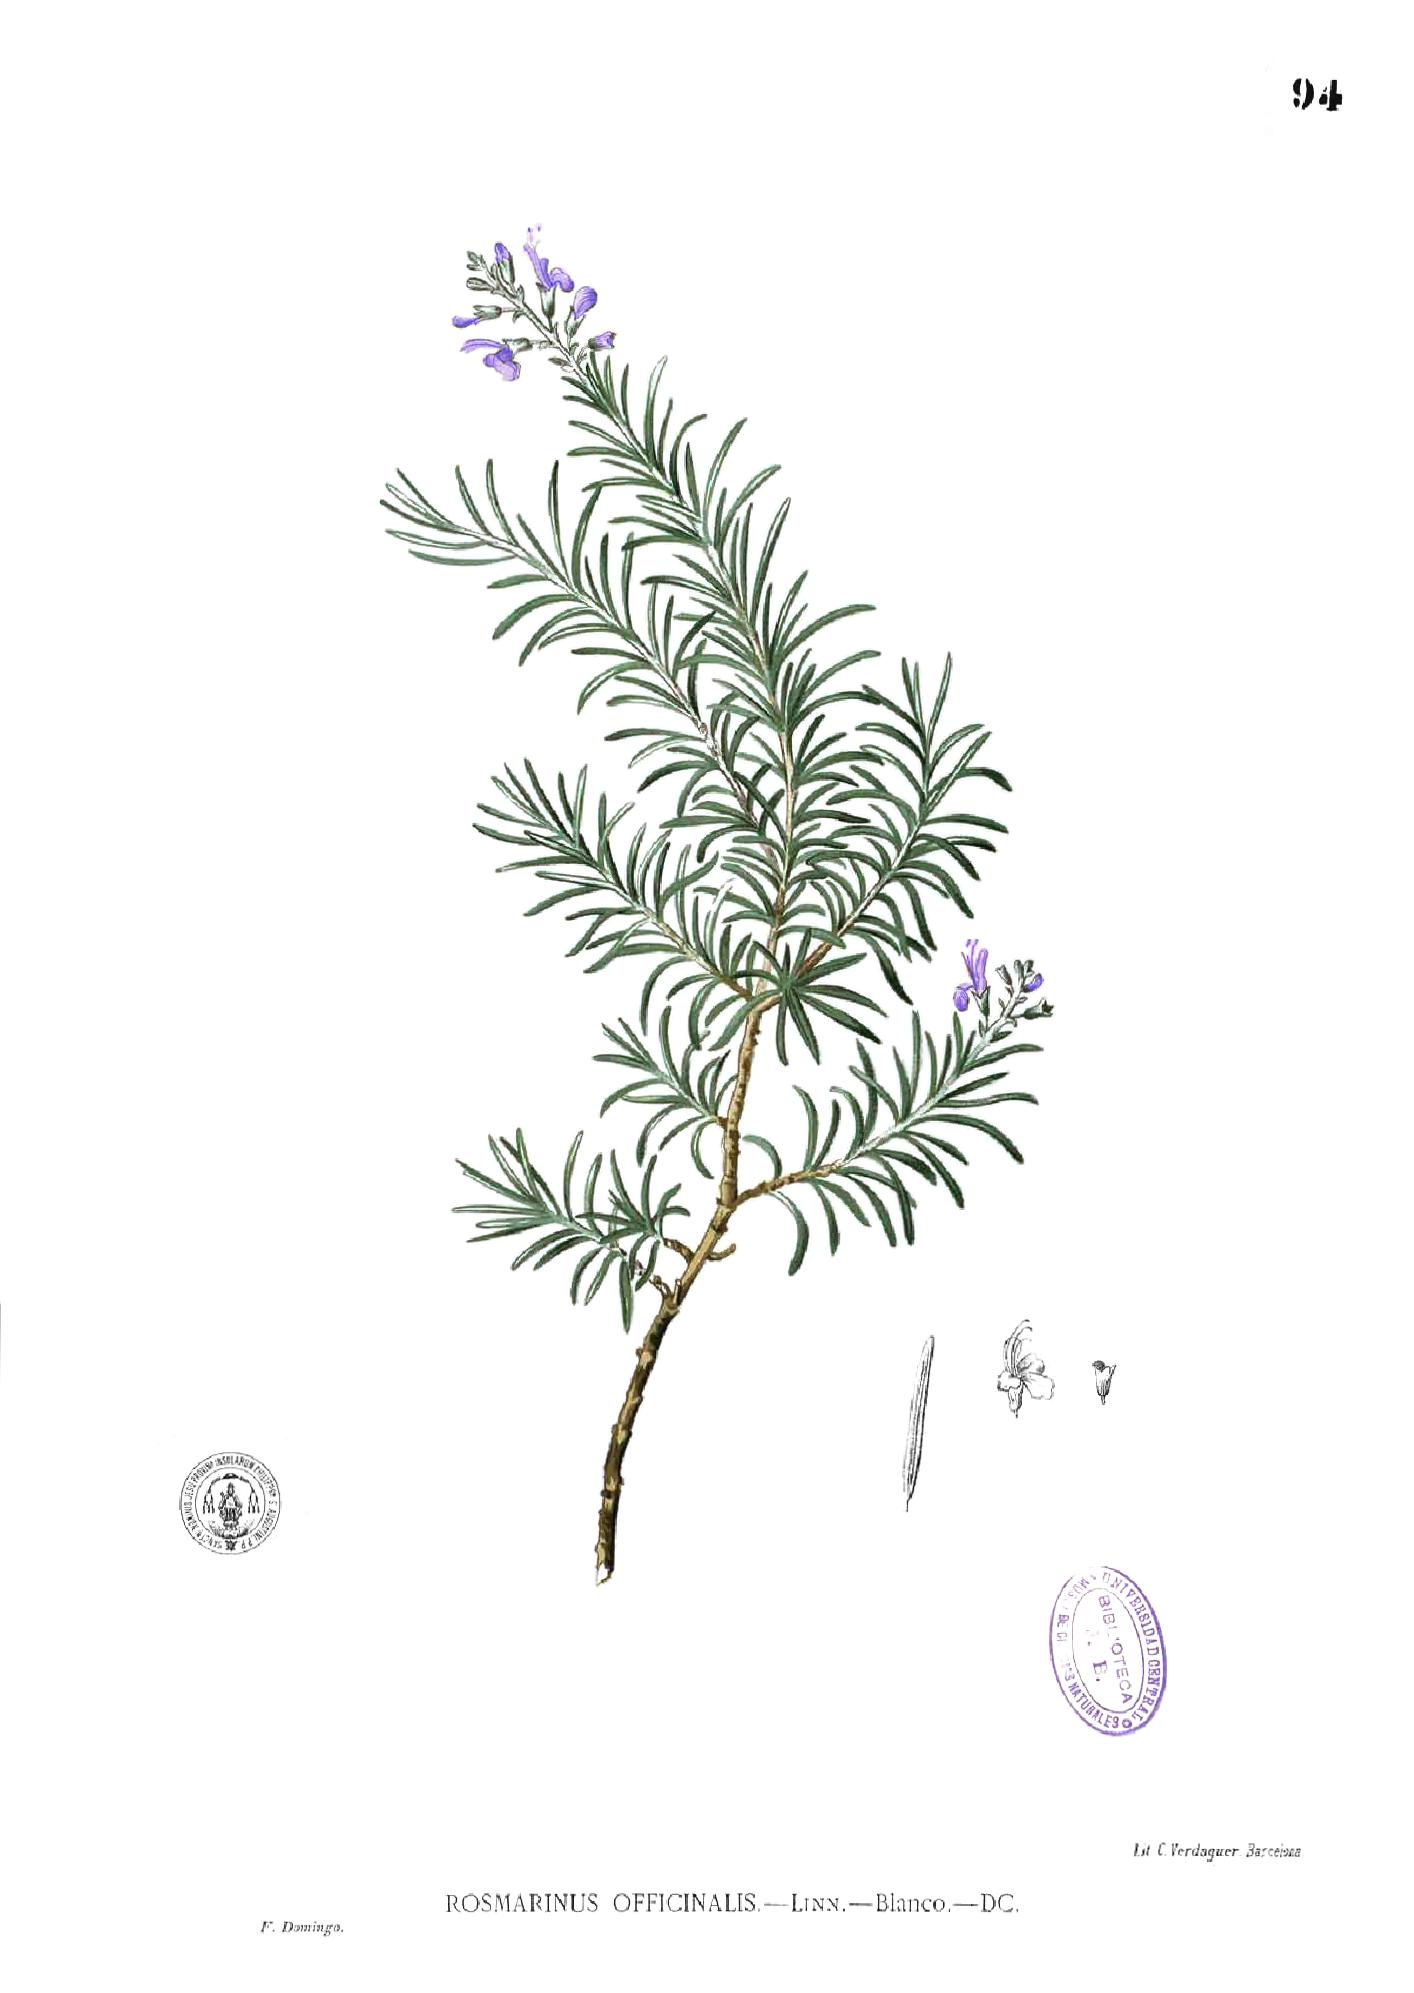 File:Rosmarinus officinalis Blanco1.94.png - Wikimedia Commons